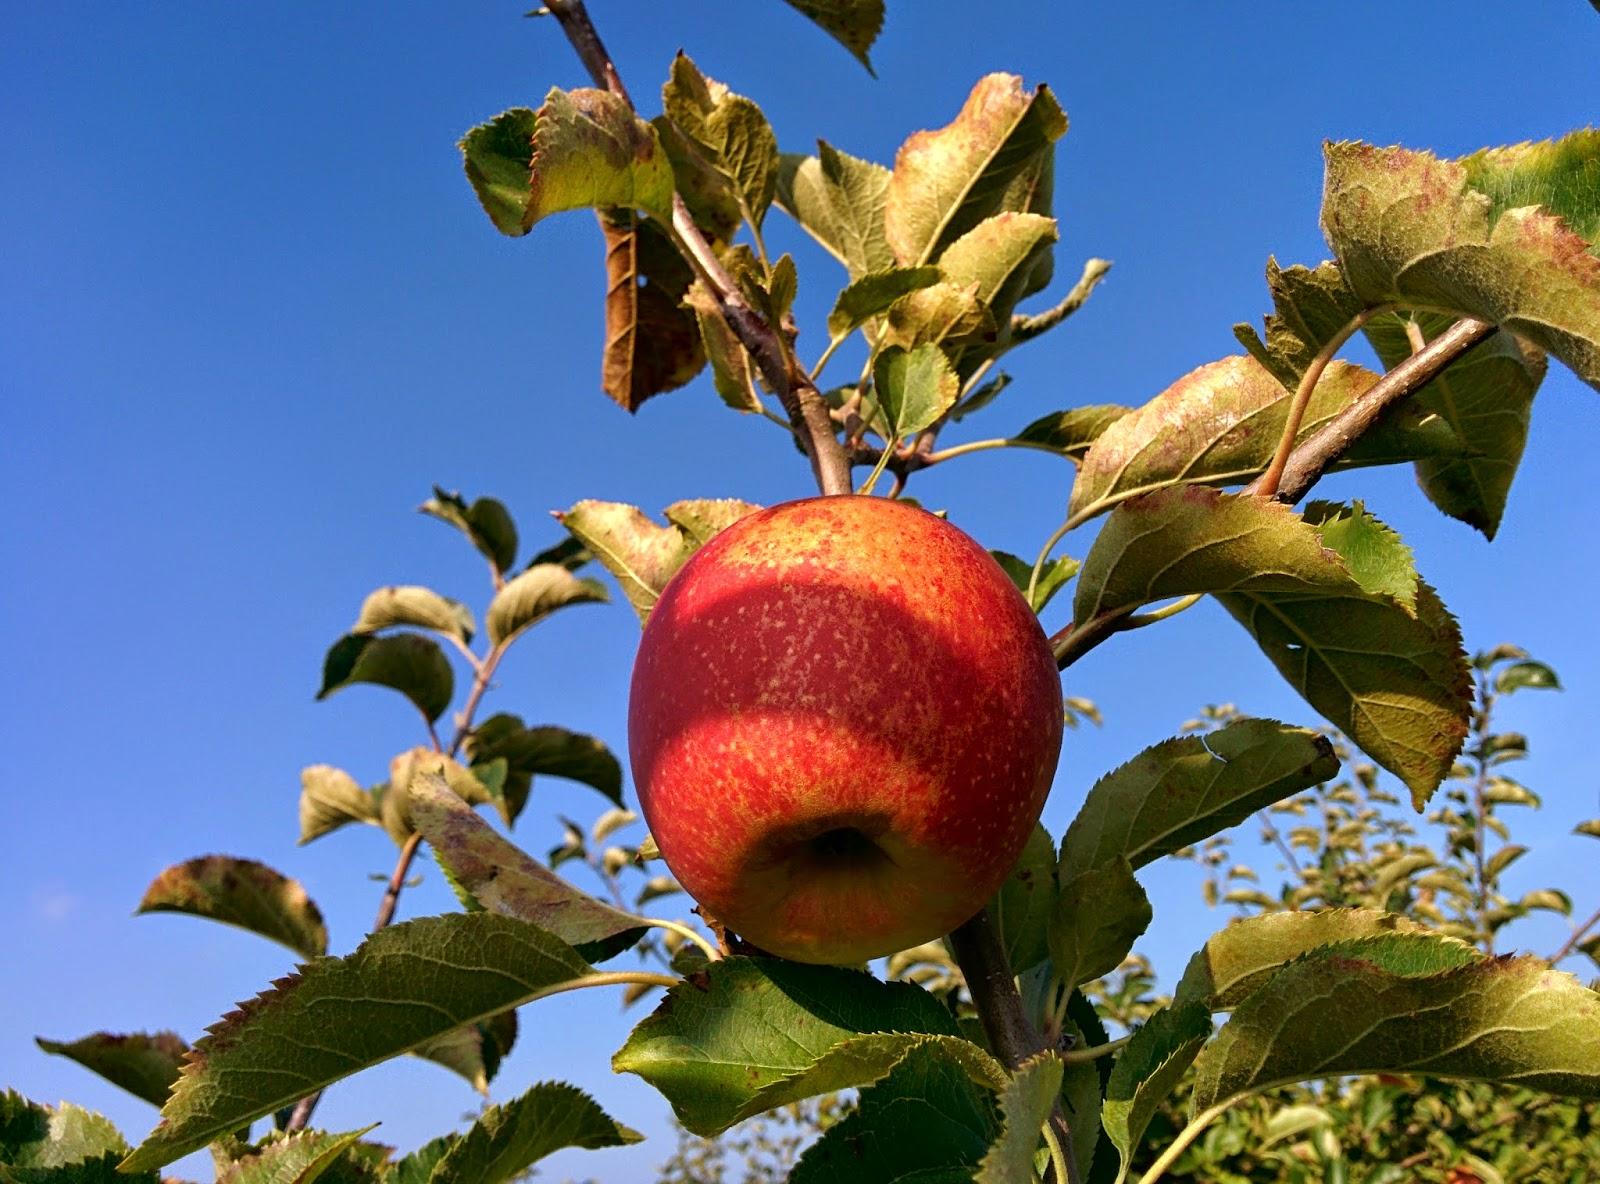 The Real Treat Apfel Mohn Marzipan Blechkuchen